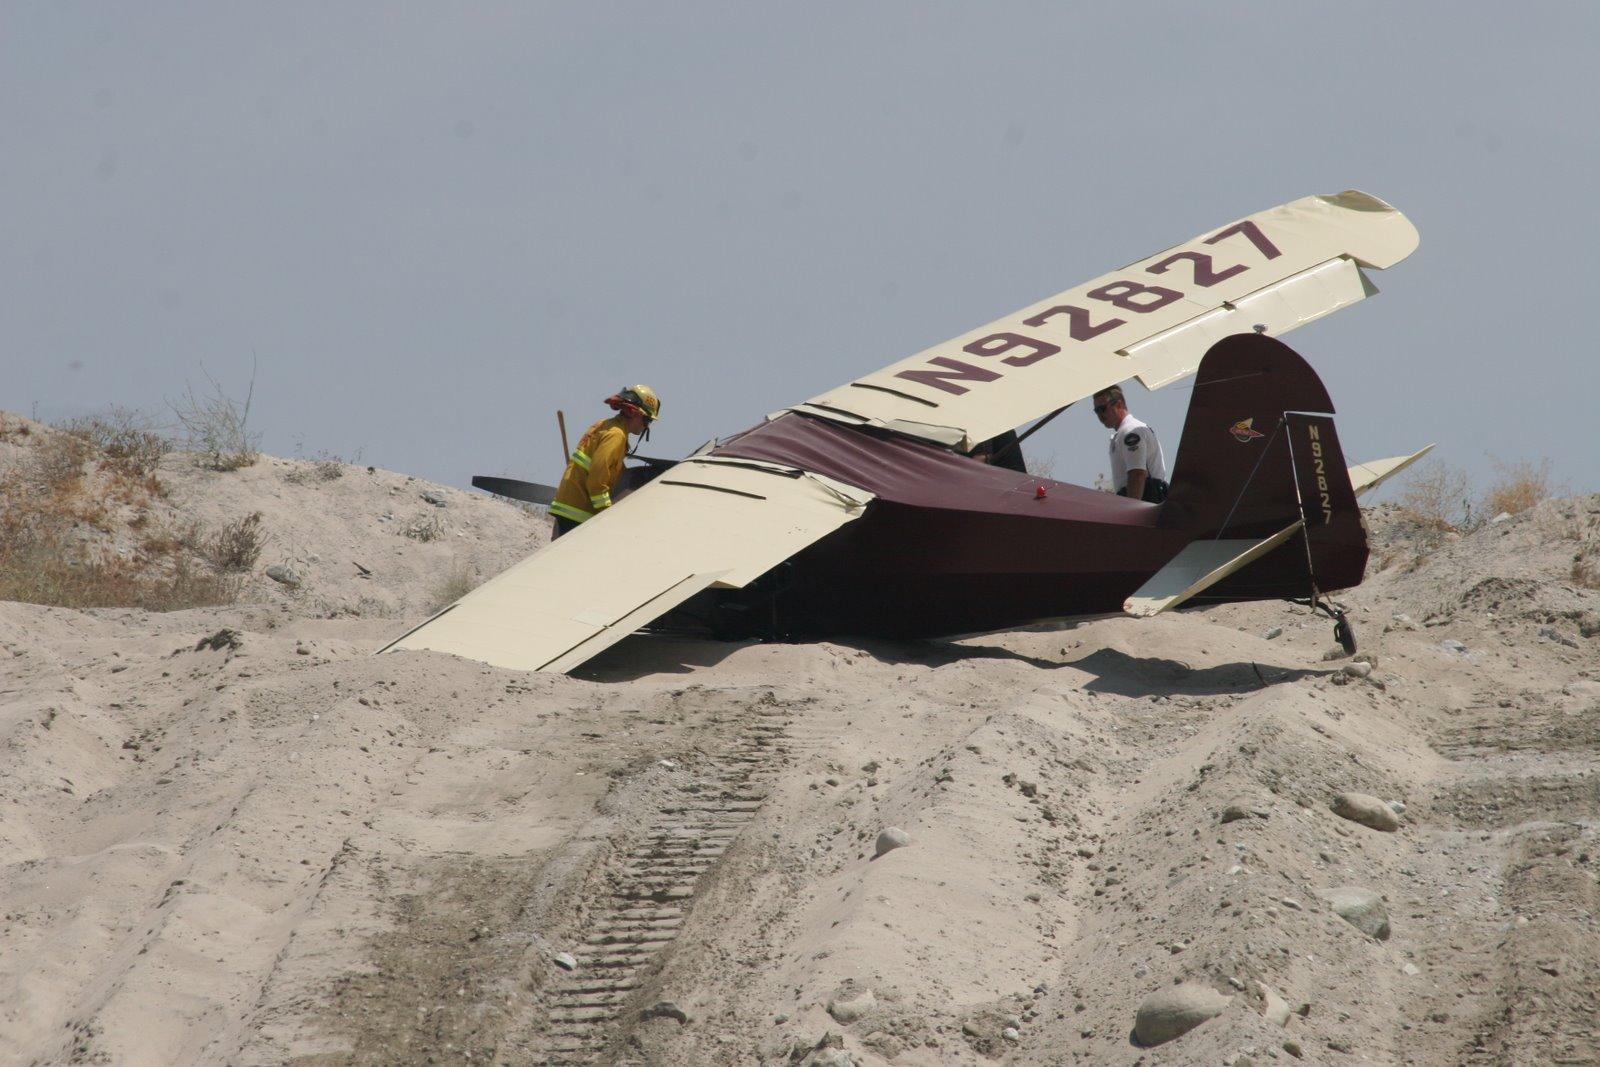 http://3.bp.blogspot.com/-1IXfUXg-VIs/TnQxBxONHfI/AAAAAAAAGTM/mjyaUEO8jko/s1600/Plane+crash+pictures+3.jpg